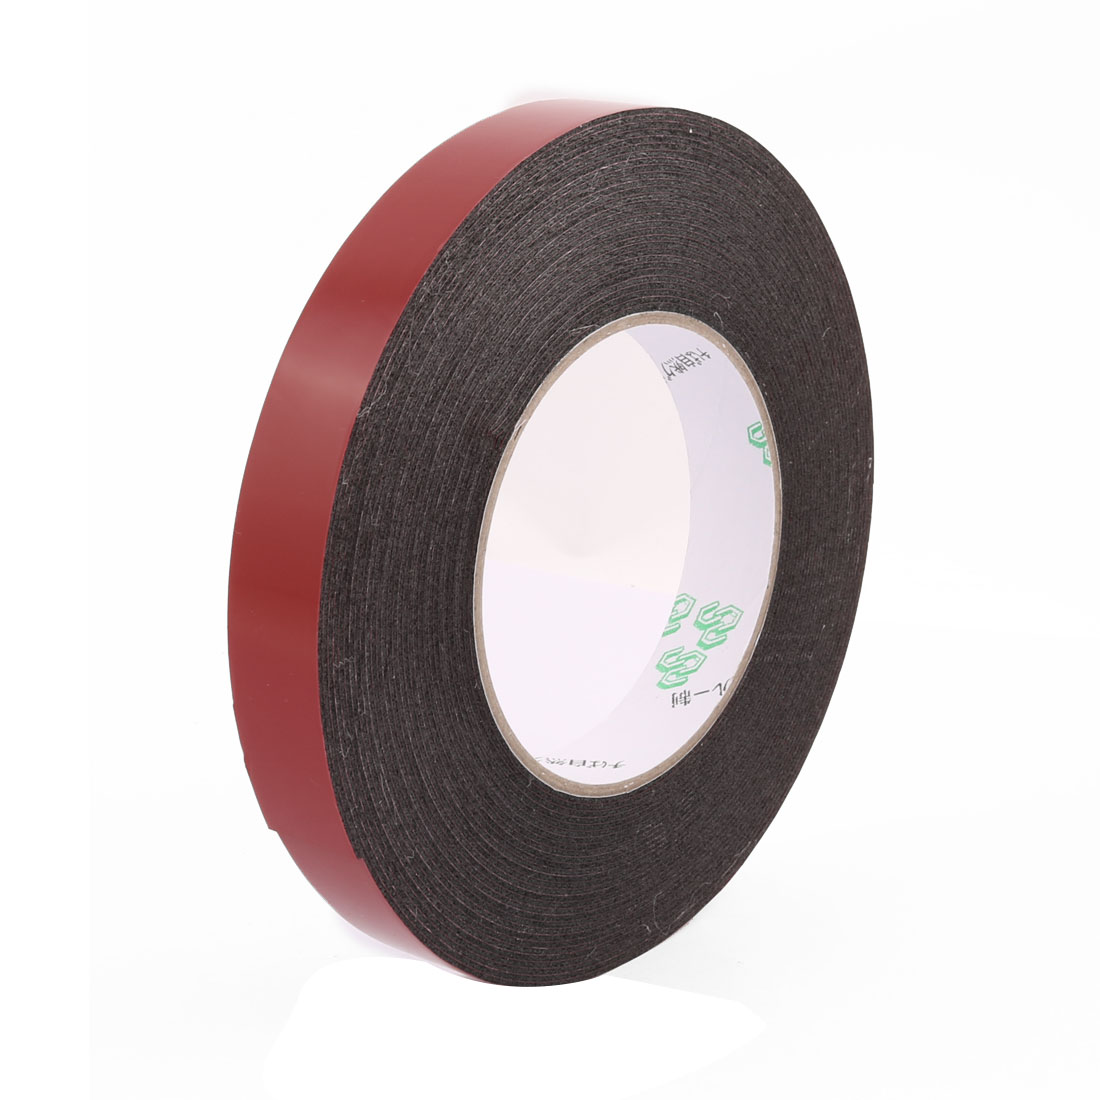 15mmx1mm Double Sided Sponge Tape Adhesive Sticker Foam Glue Strip Sealing 10 Meters